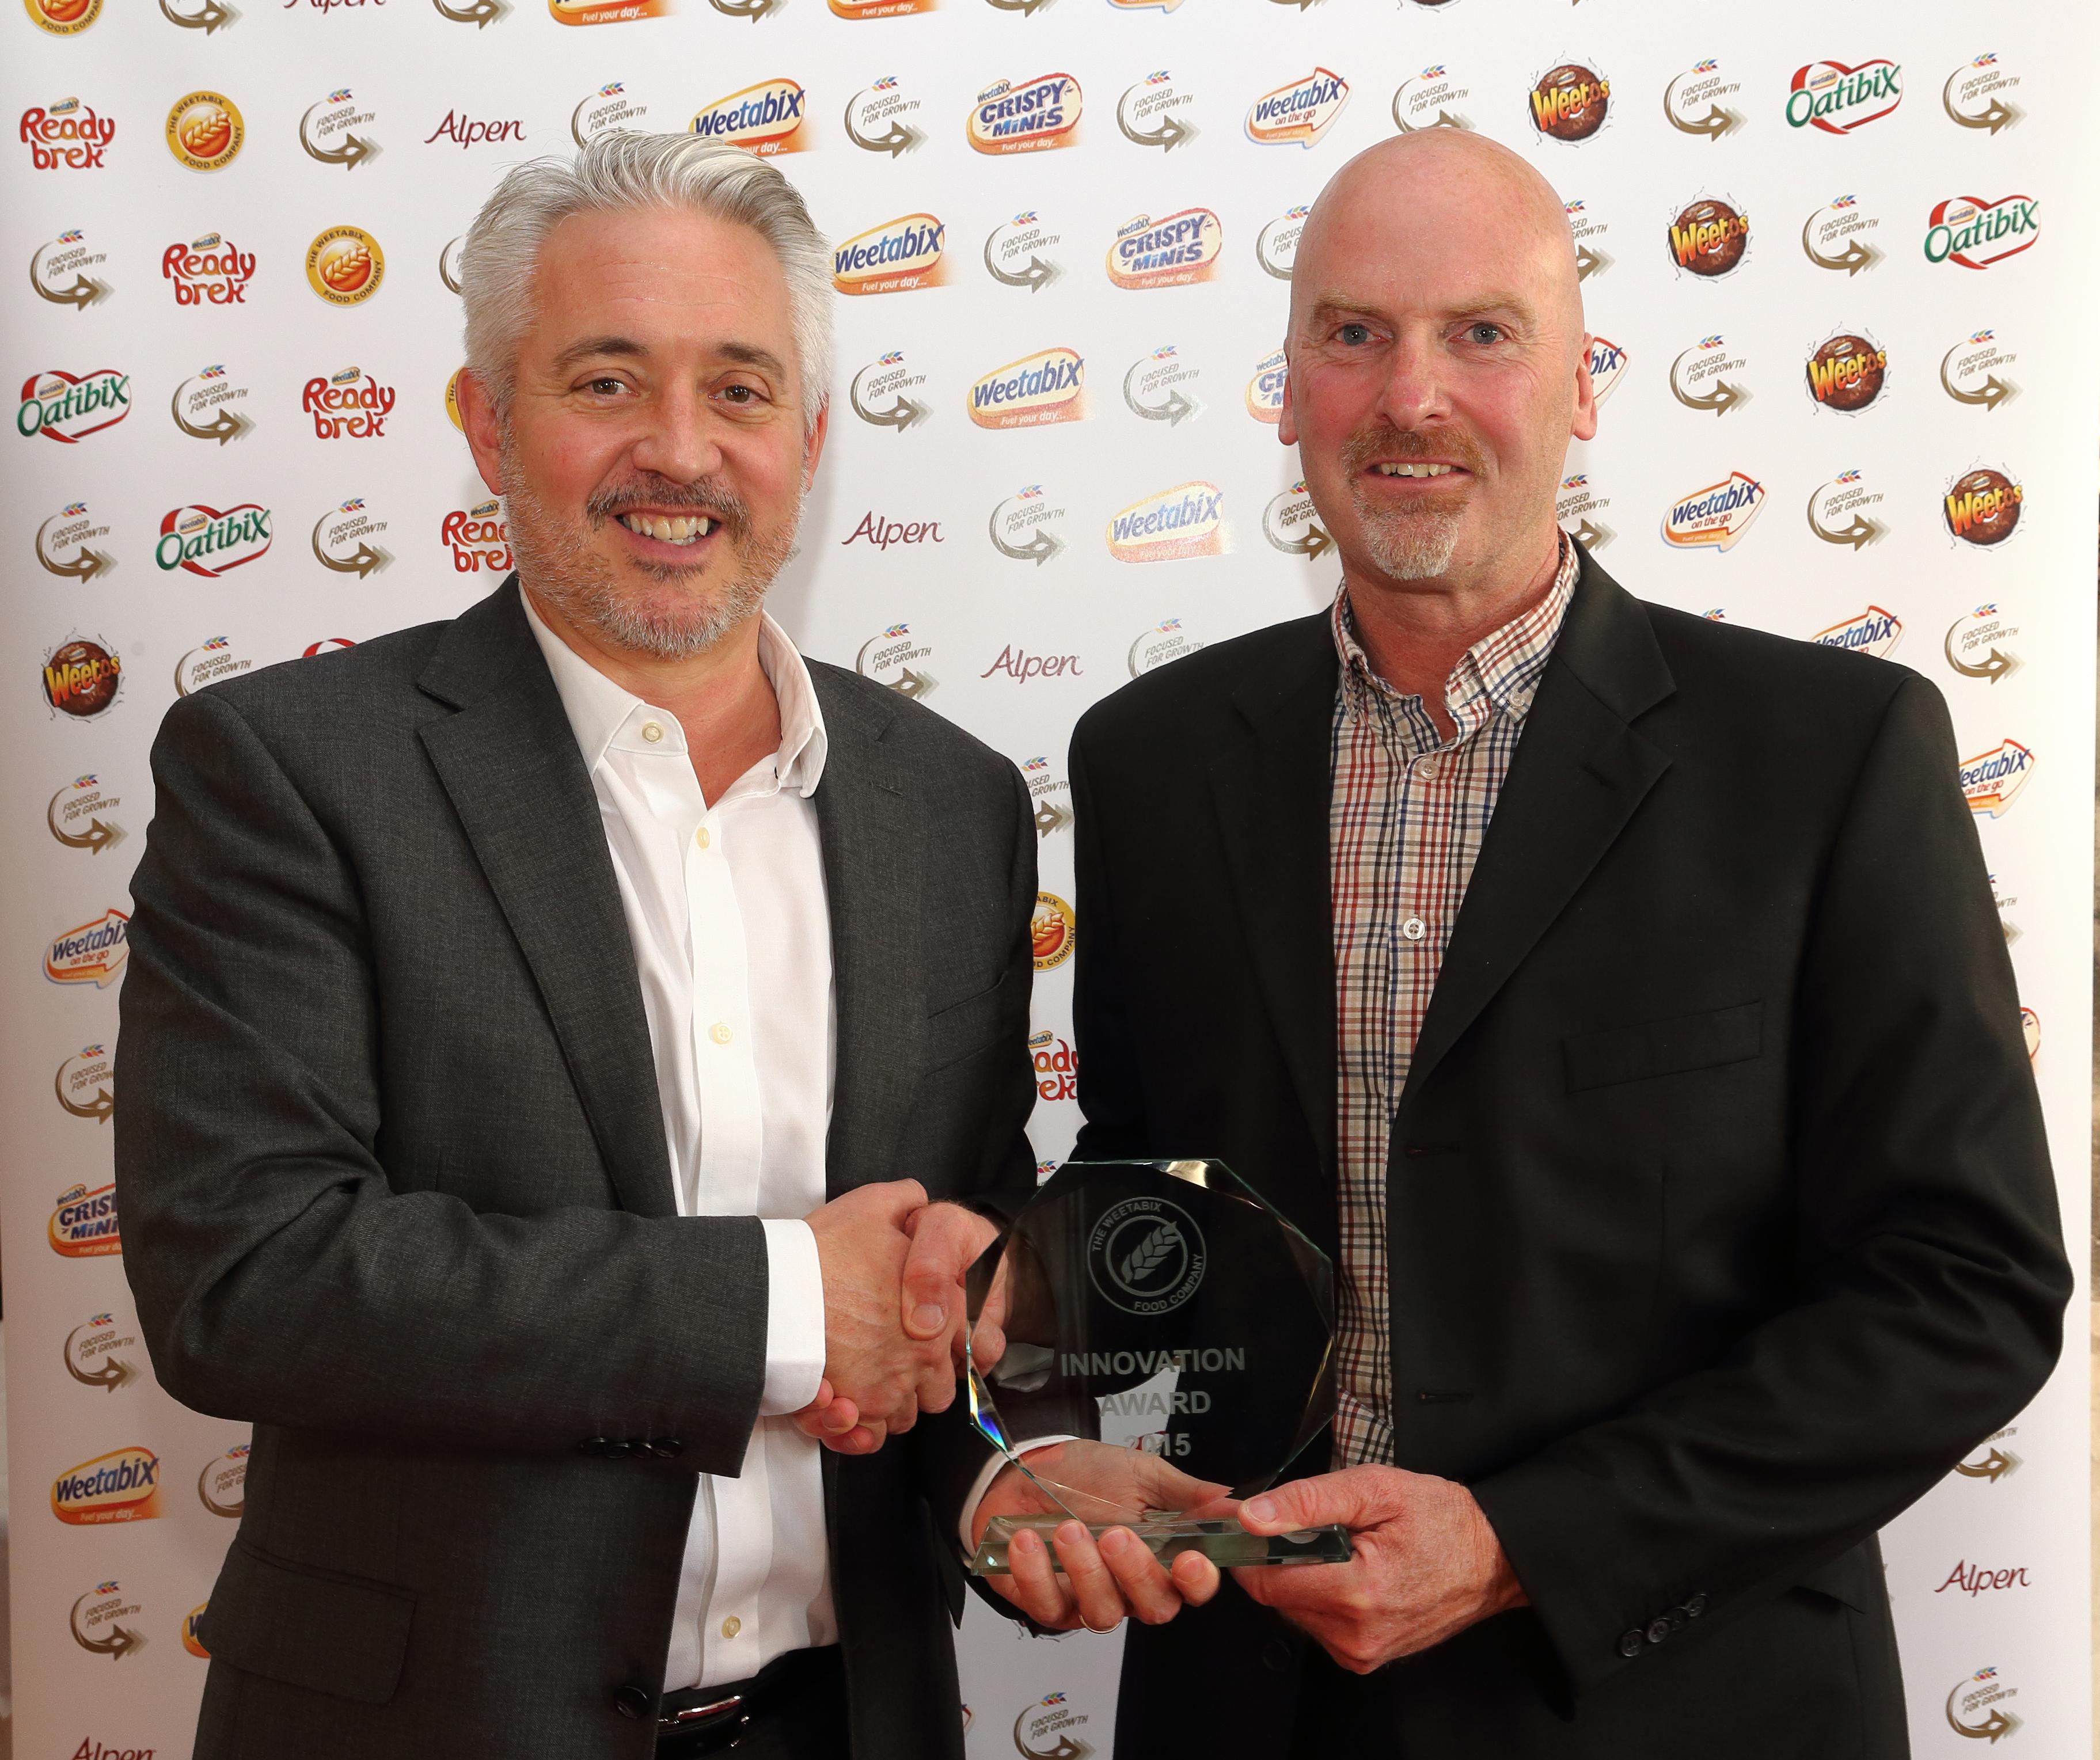 PEME wins 2015 Weetabix Innovation Award for Asset Care